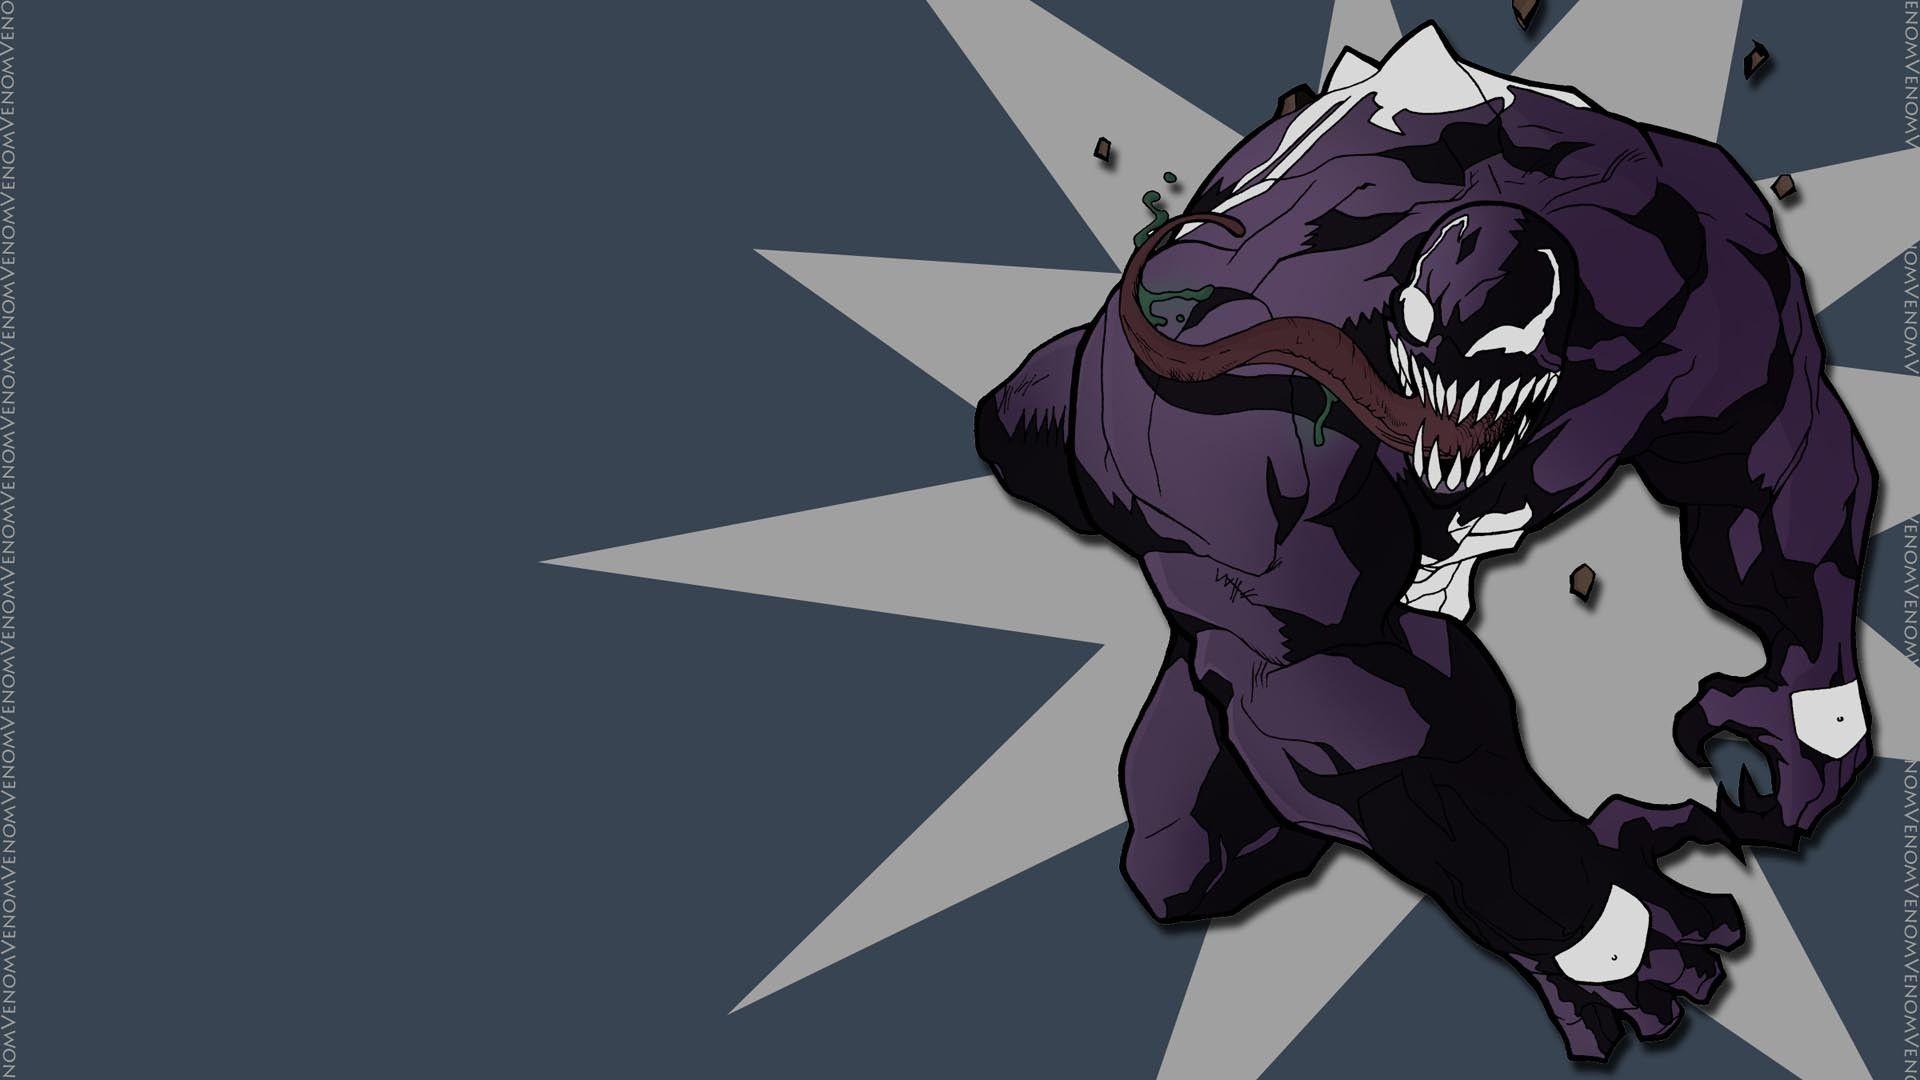 1920x1080 Wallpapers For Venom Wallpaper 1080p Comic Book